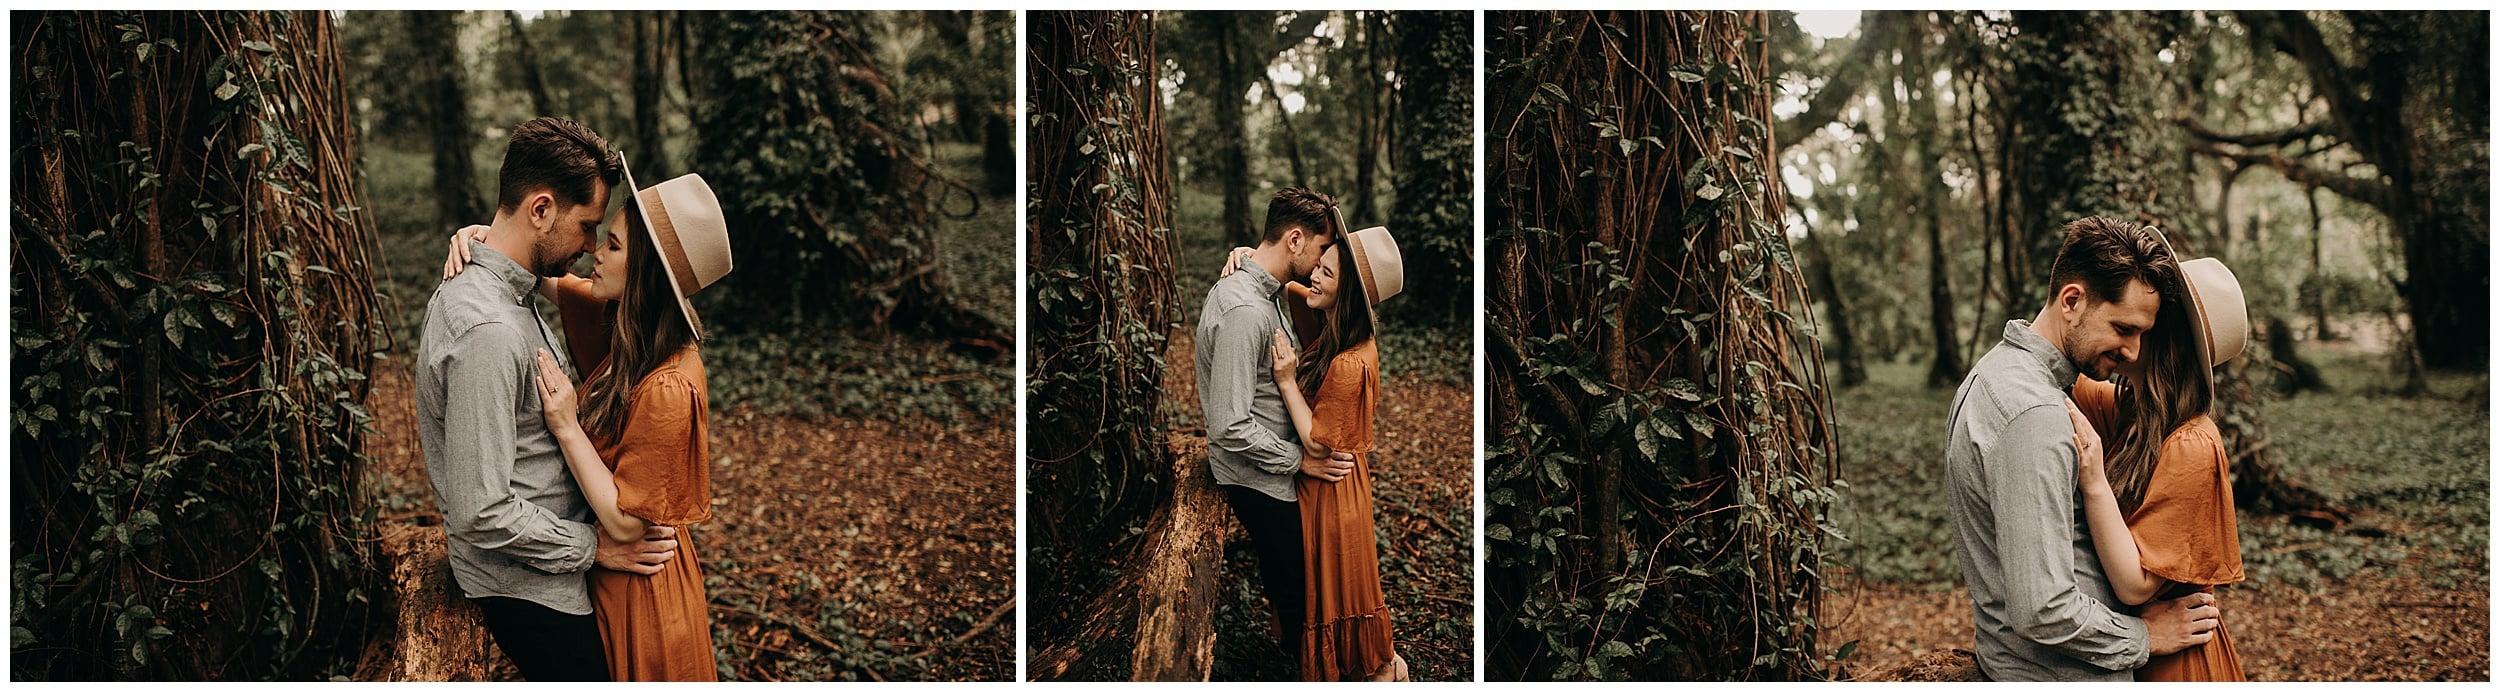 Maui couples photographer_0007